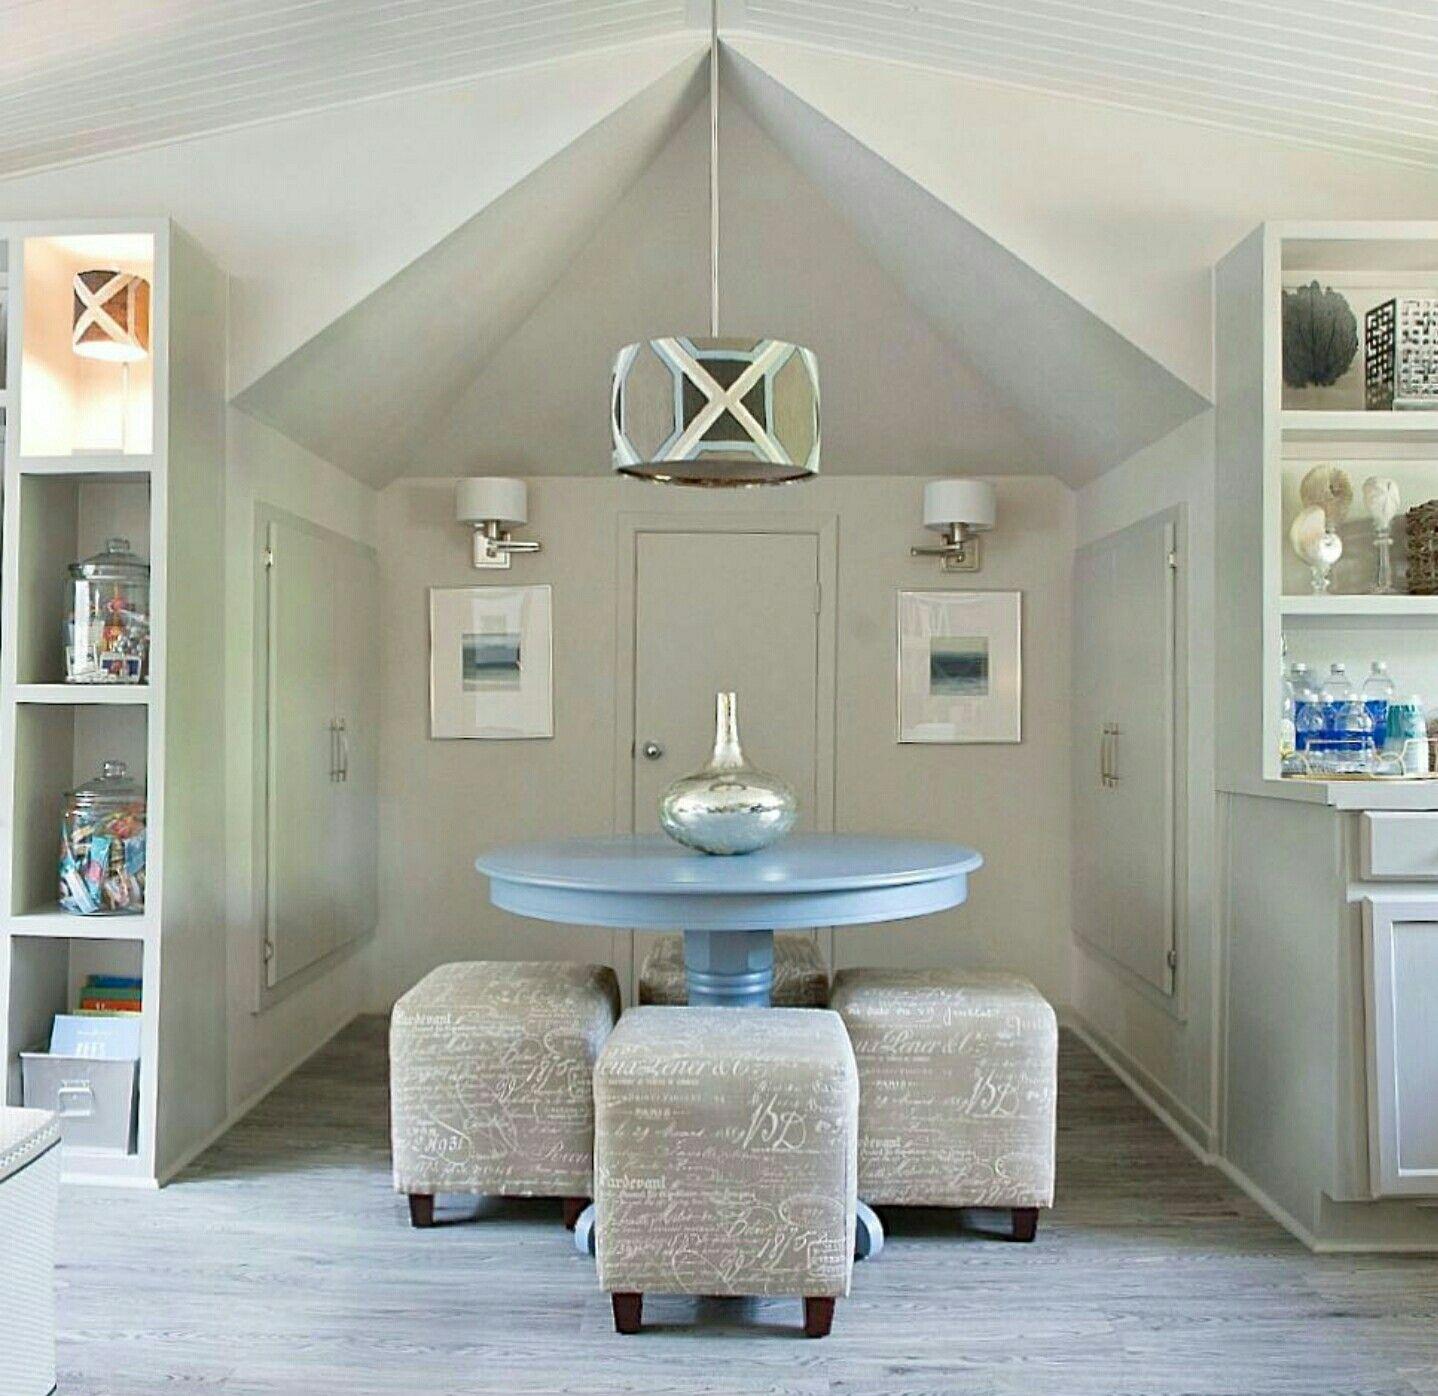 pinkarla jones on home decor  repose gray mindful